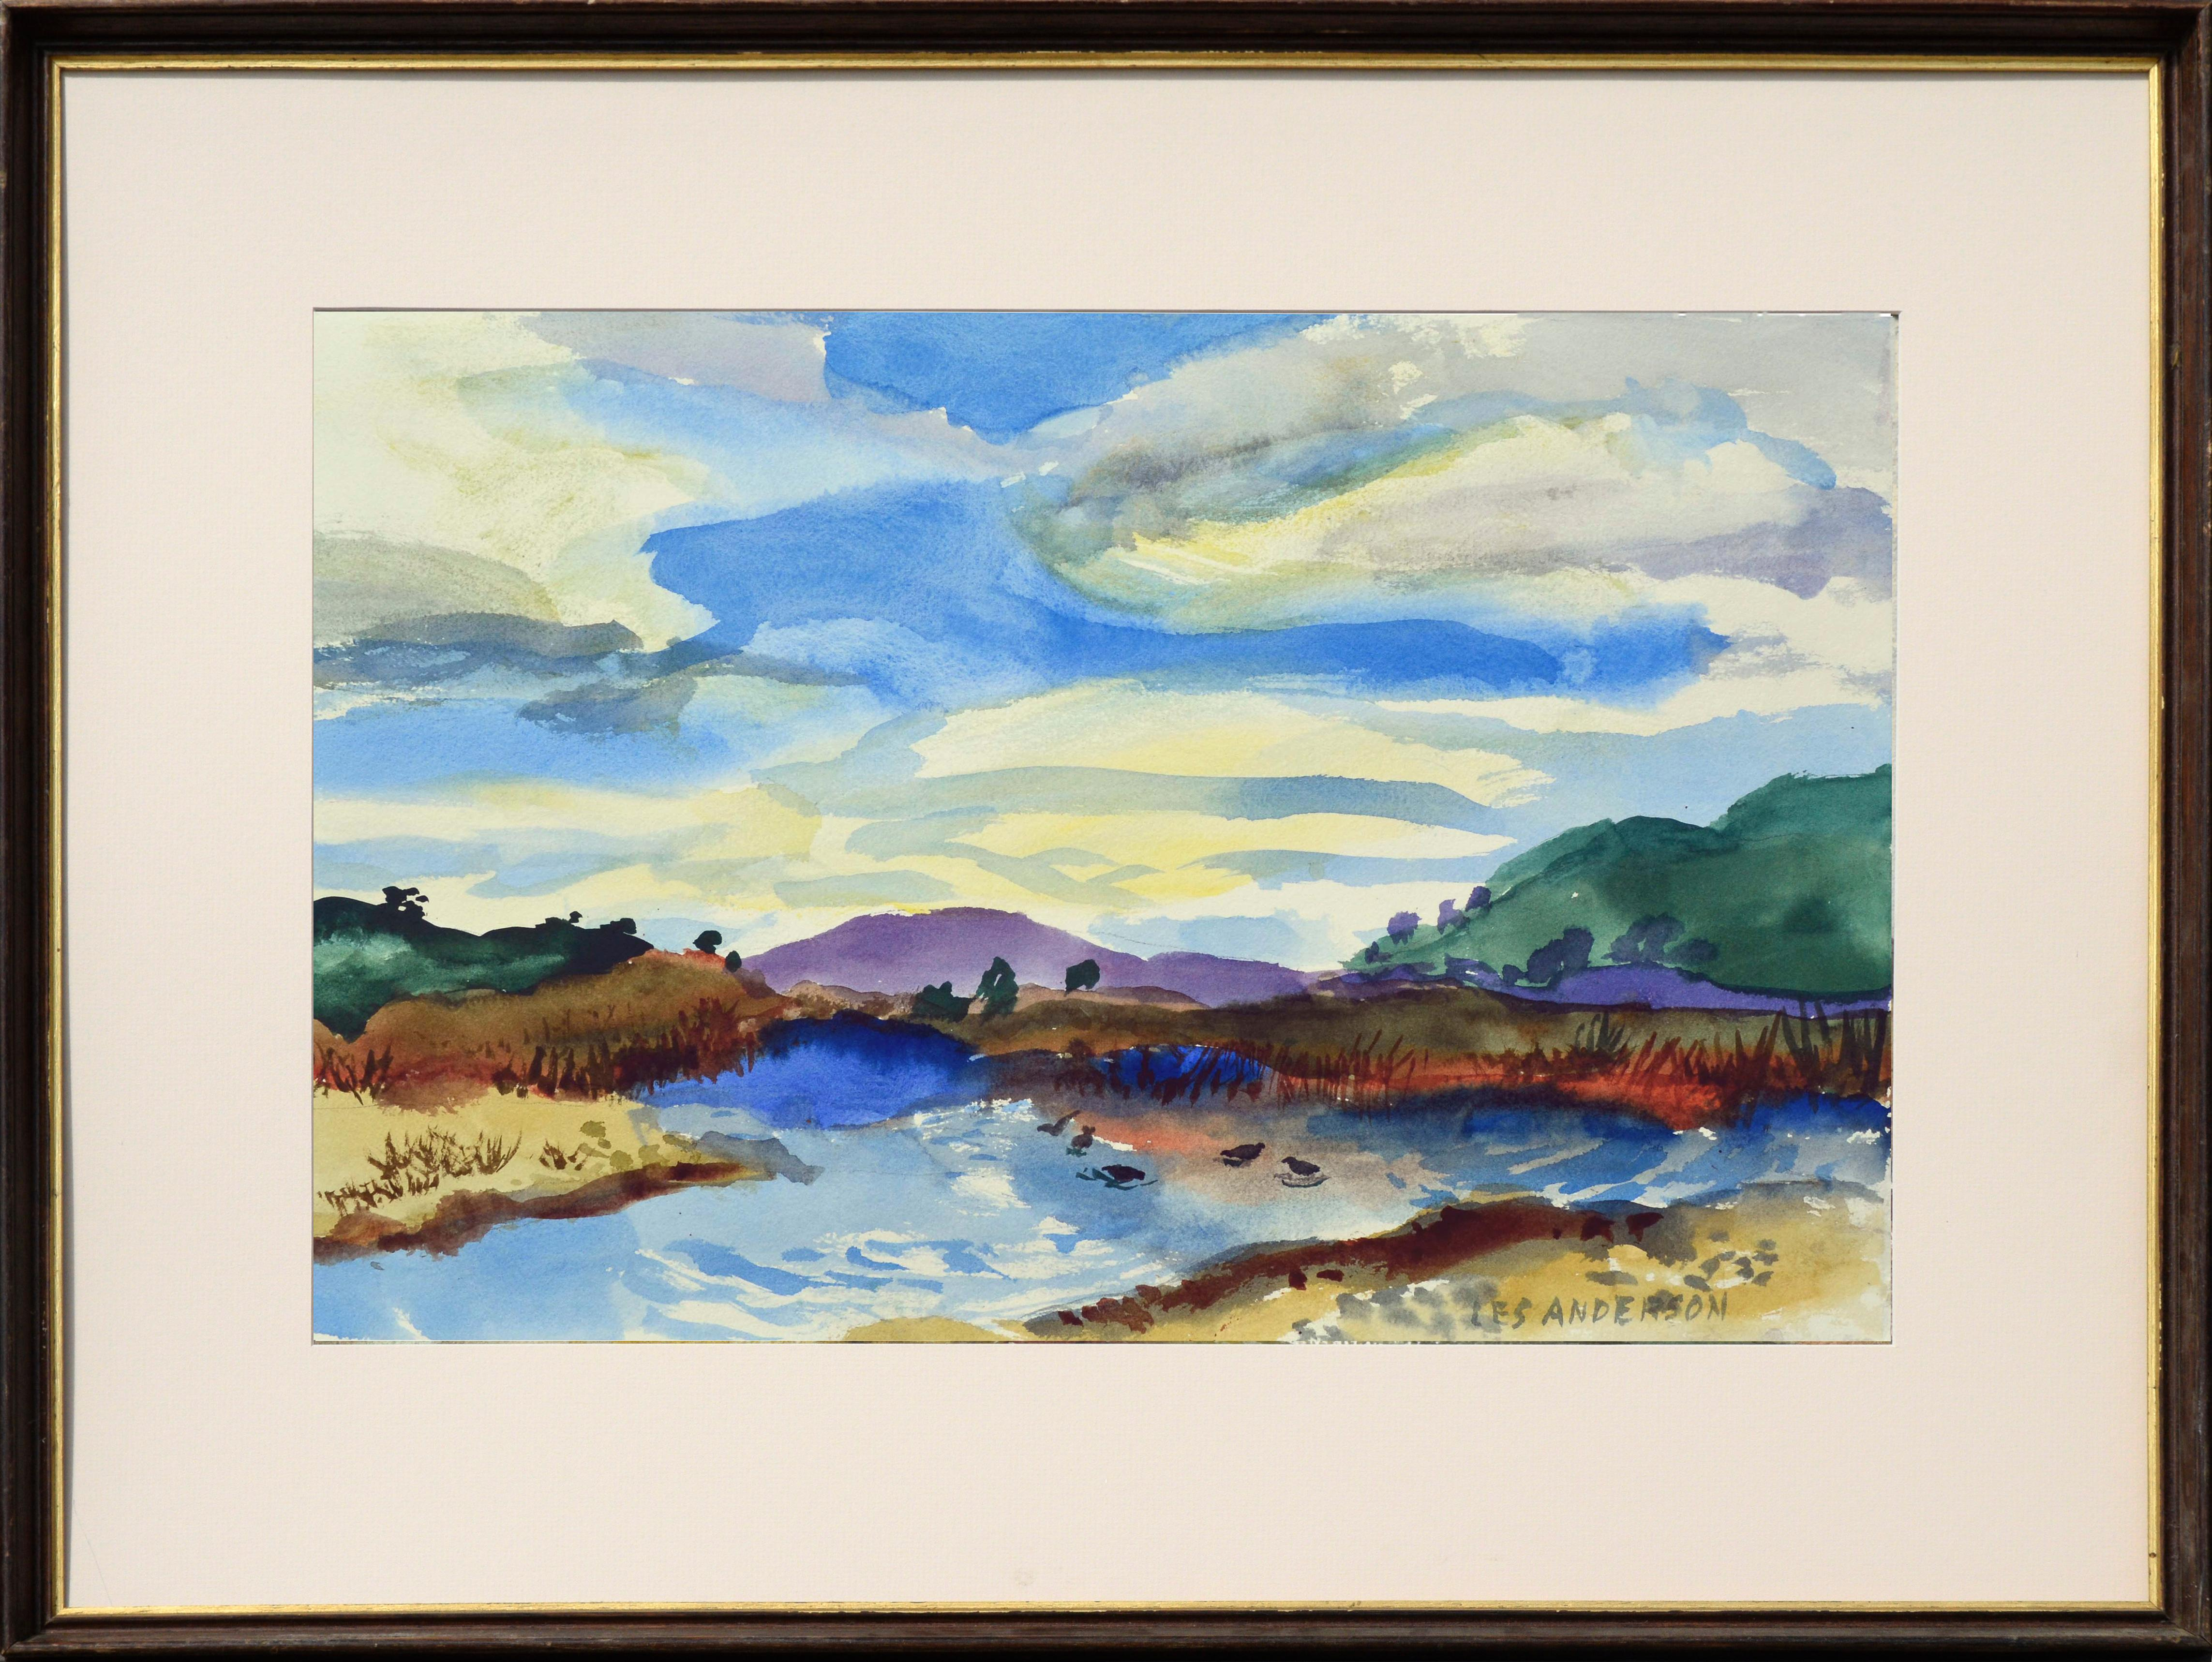 Duck Pond Landscape, California Seascape - Double Sided Watercolor